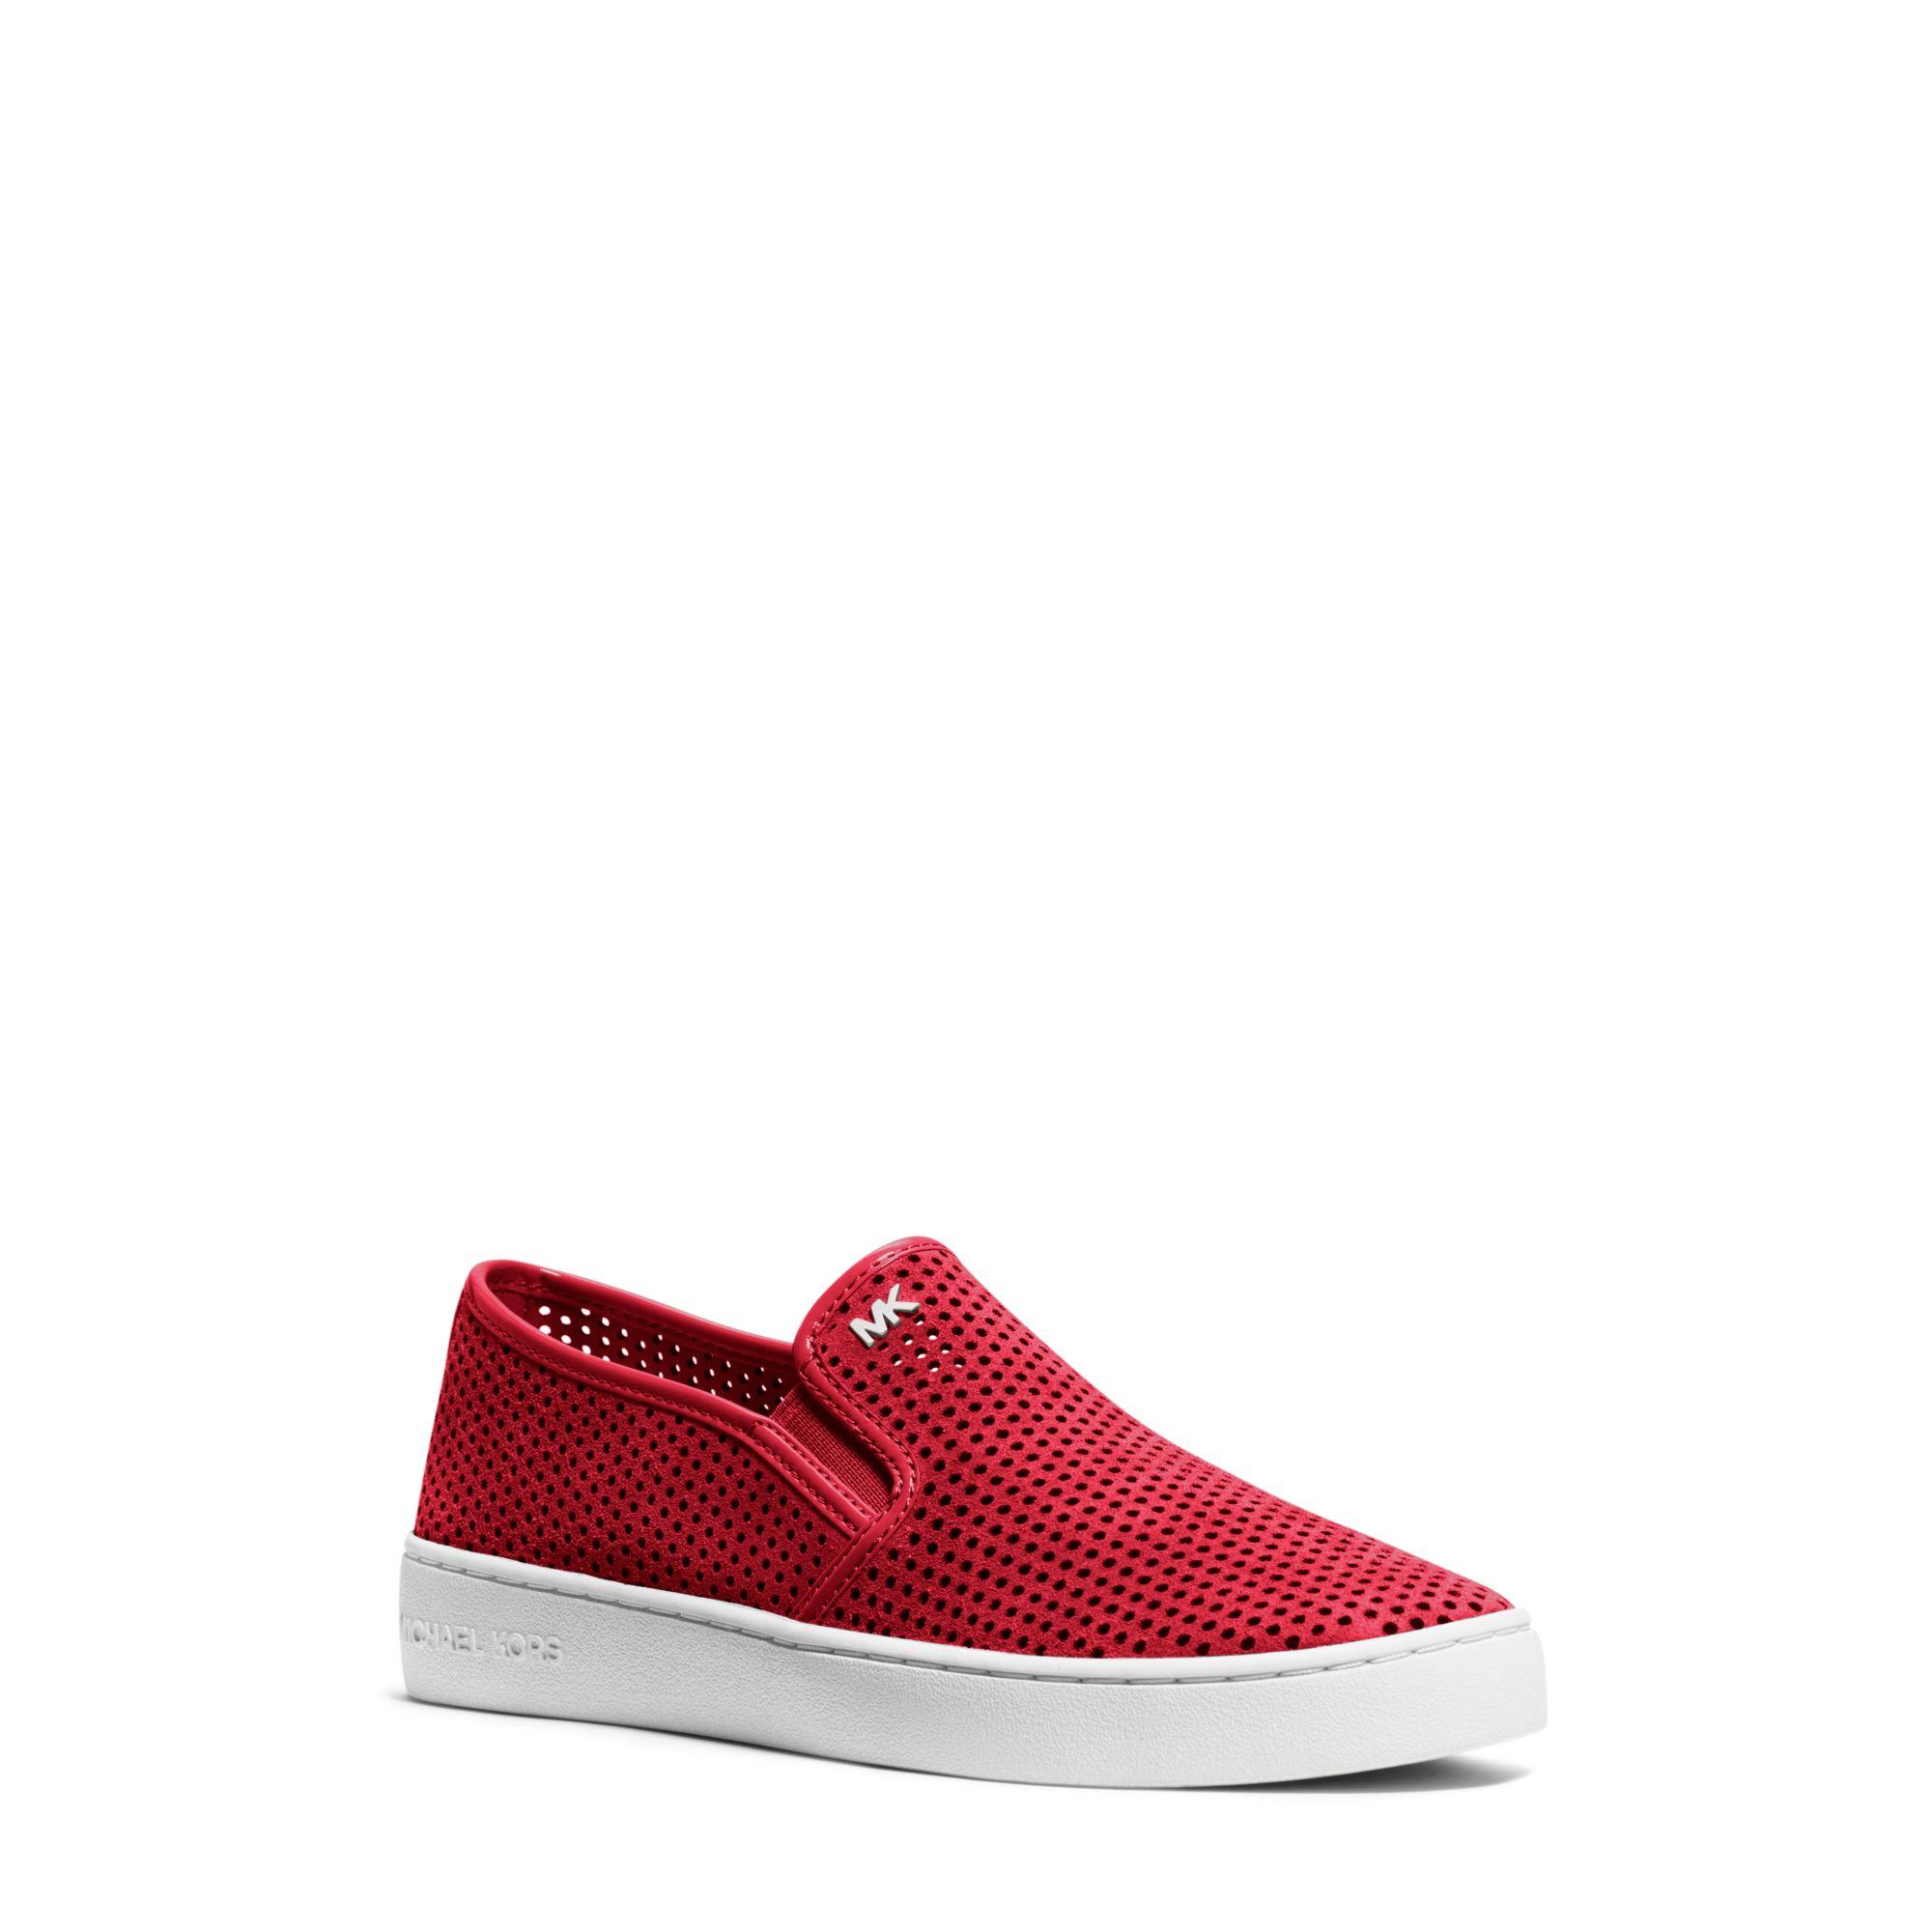 michael kors brett mesh suede slip on sneaker in red. Black Bedroom Furniture Sets. Home Design Ideas